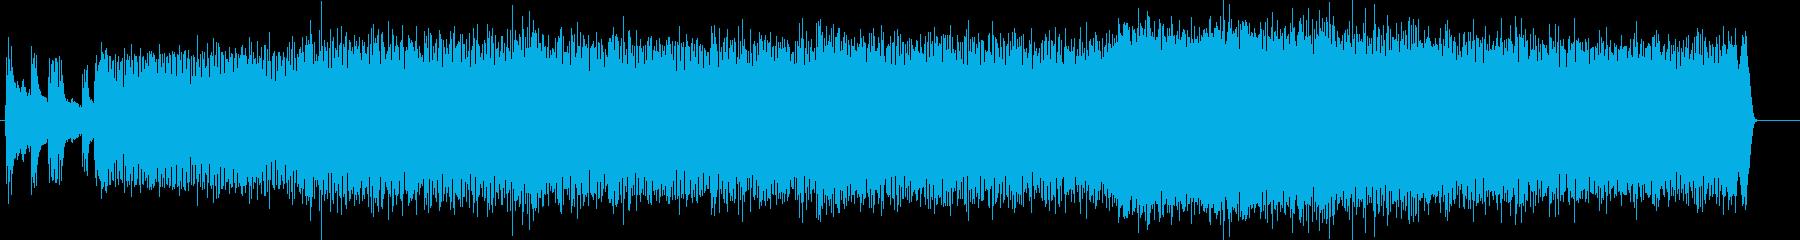 AIR BATTLE/エアー・バトルの再生済みの波形